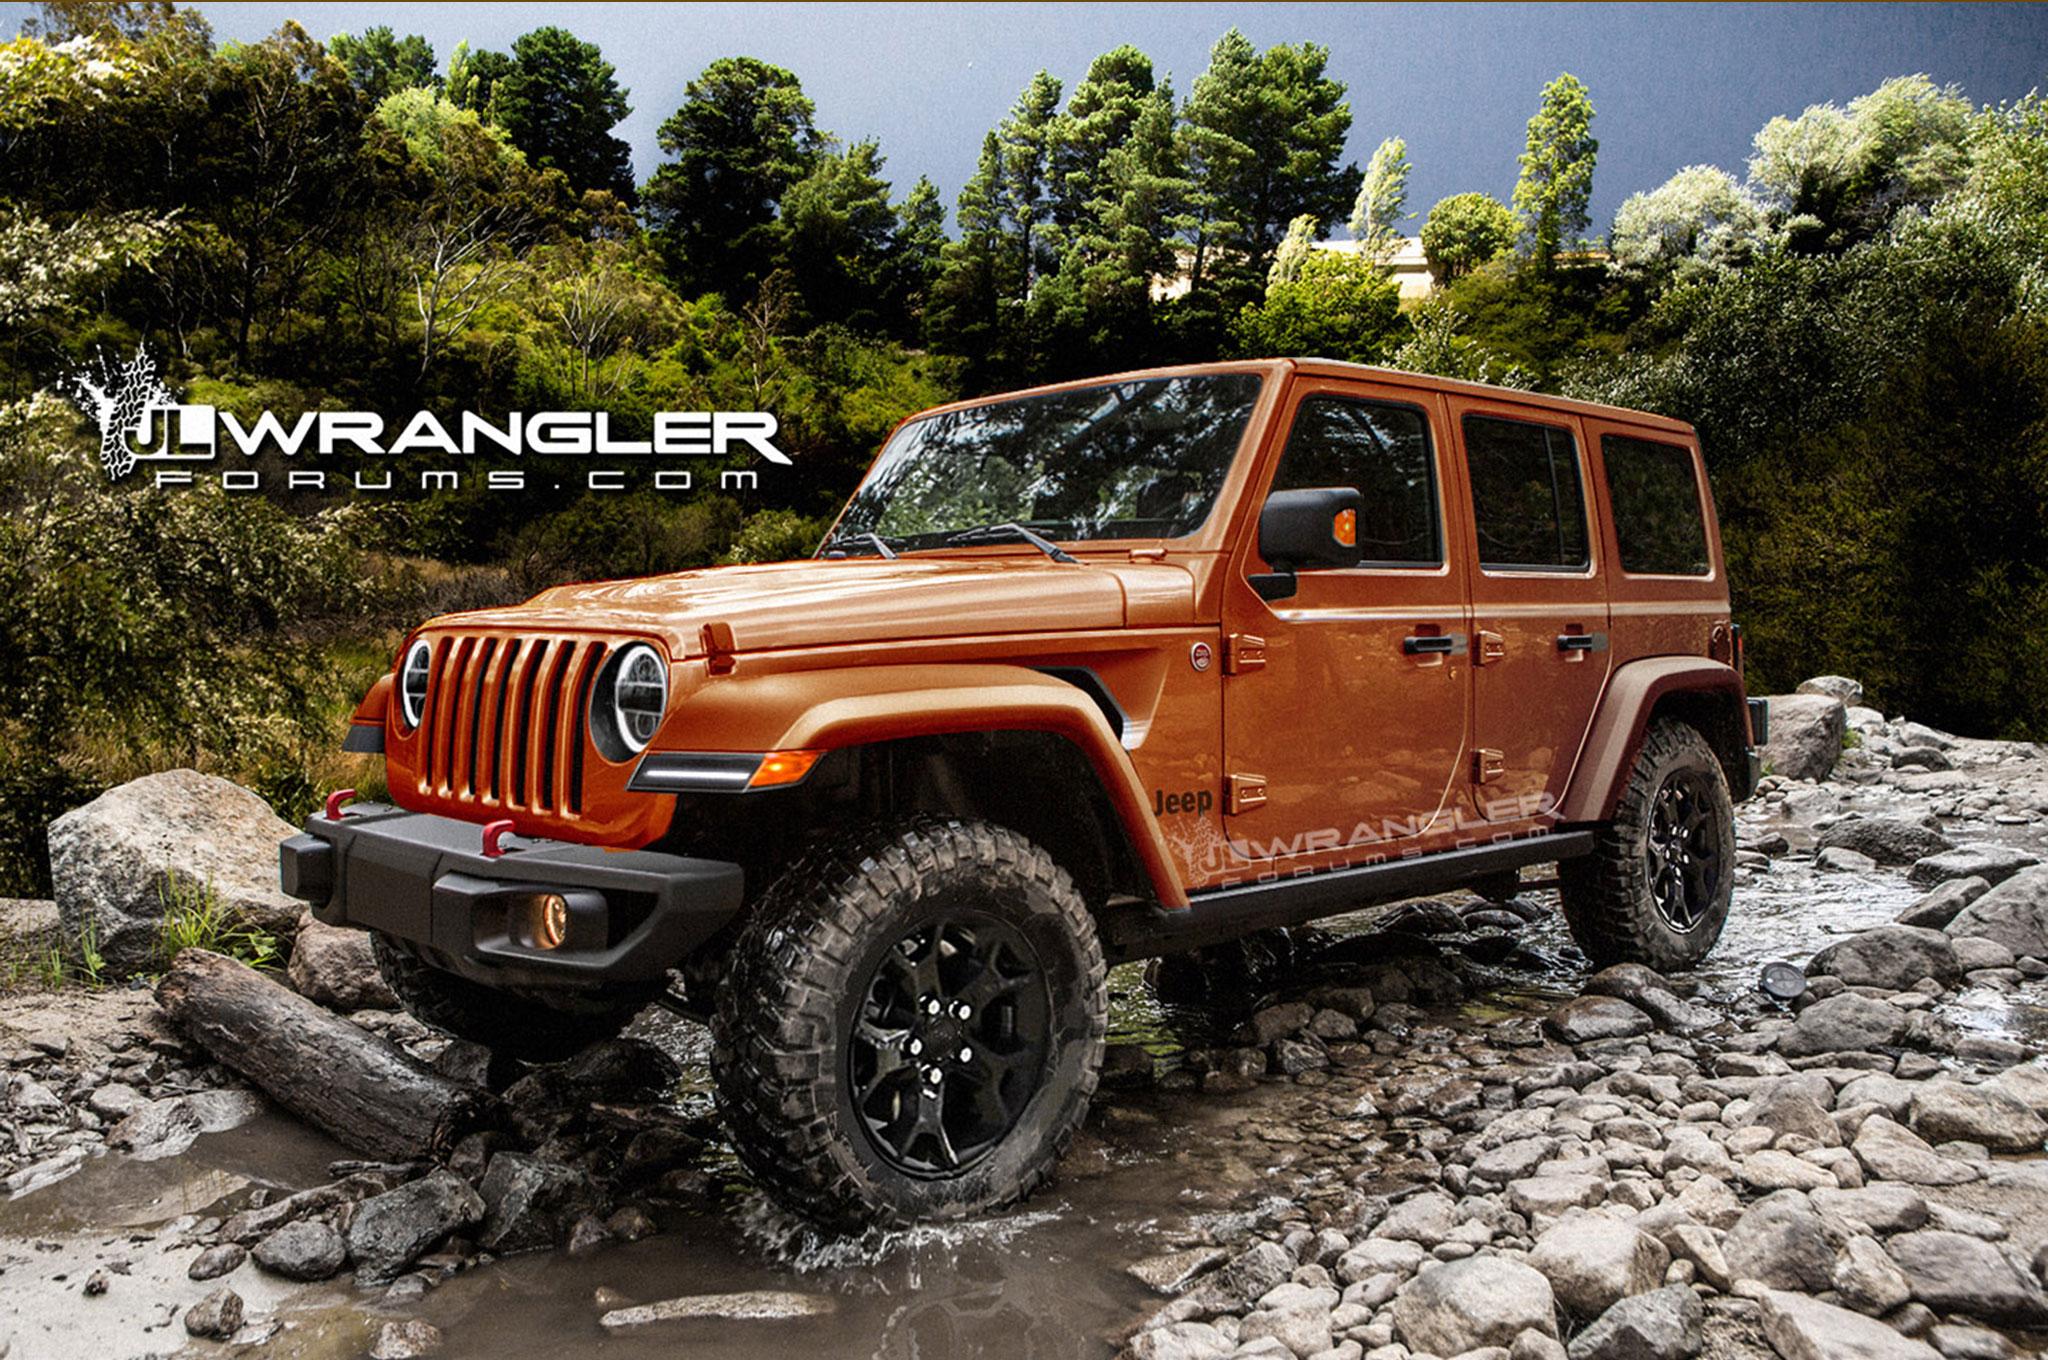 2018 Jeep Wrangler Unlimited Render 2